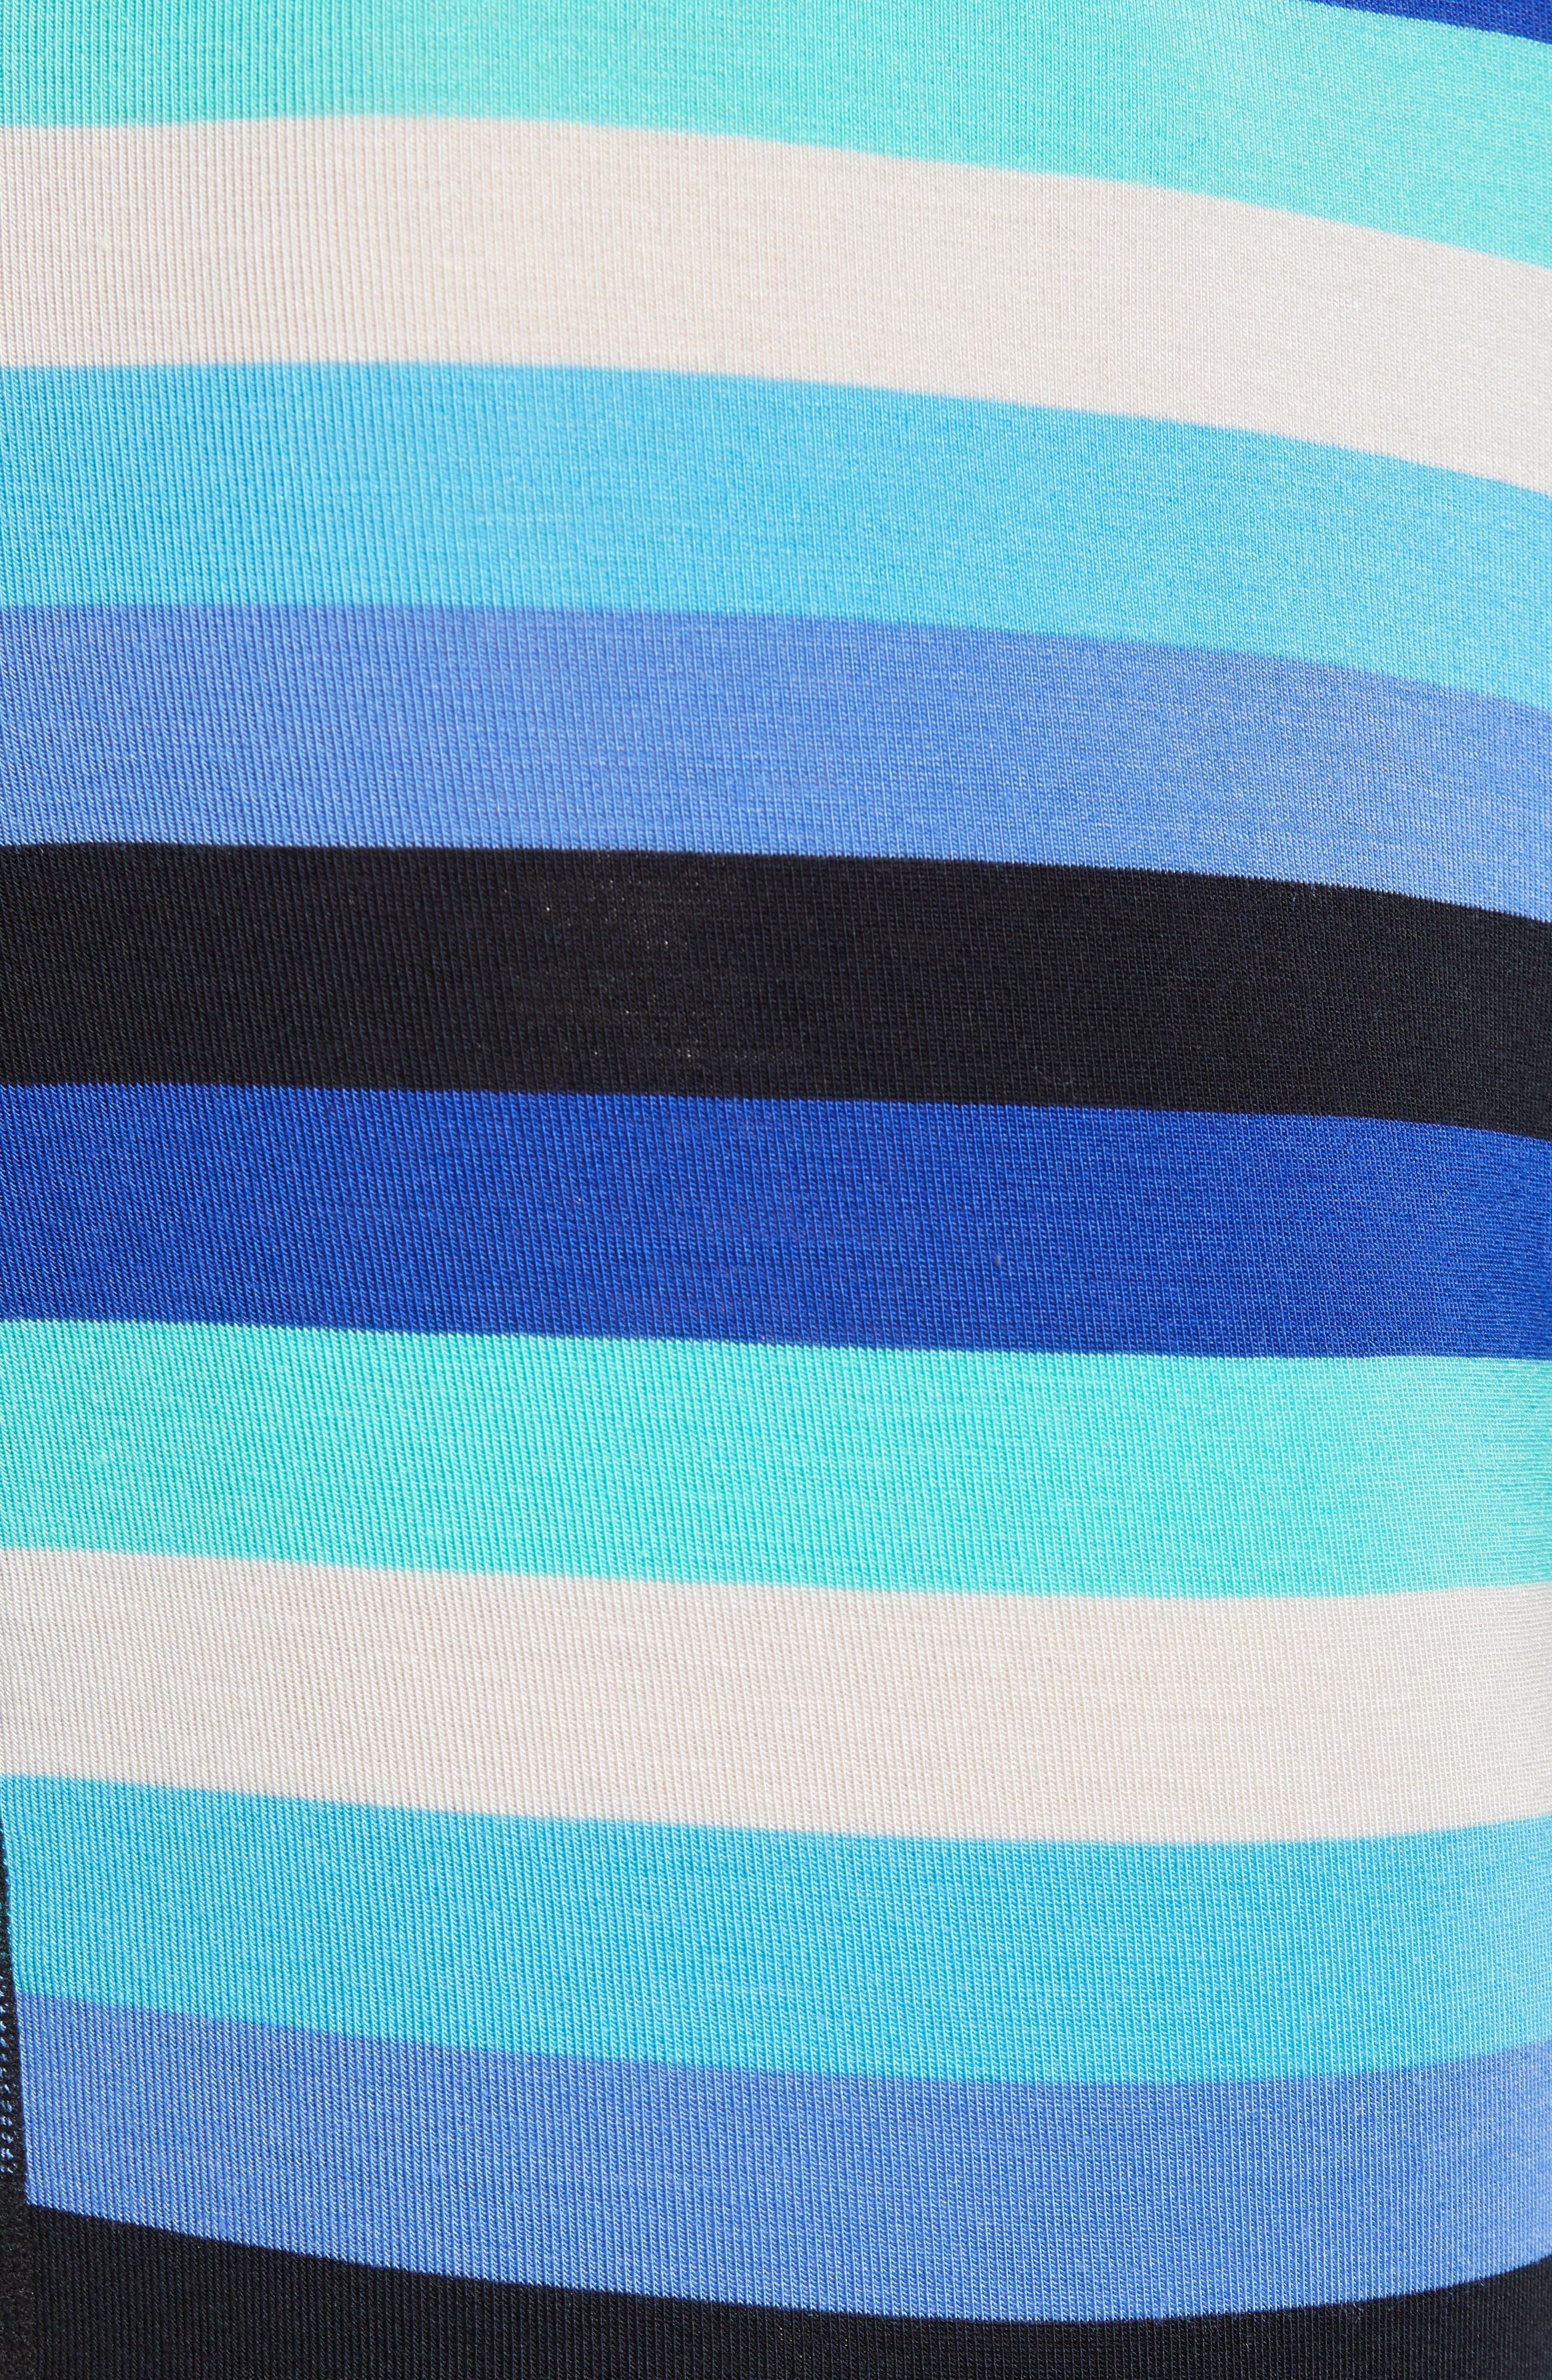 Ultra Cabana Stripe Stretch Boxer Briefs,                             Alternate thumbnail 5, color,                             BLUE CABANA STRIPE